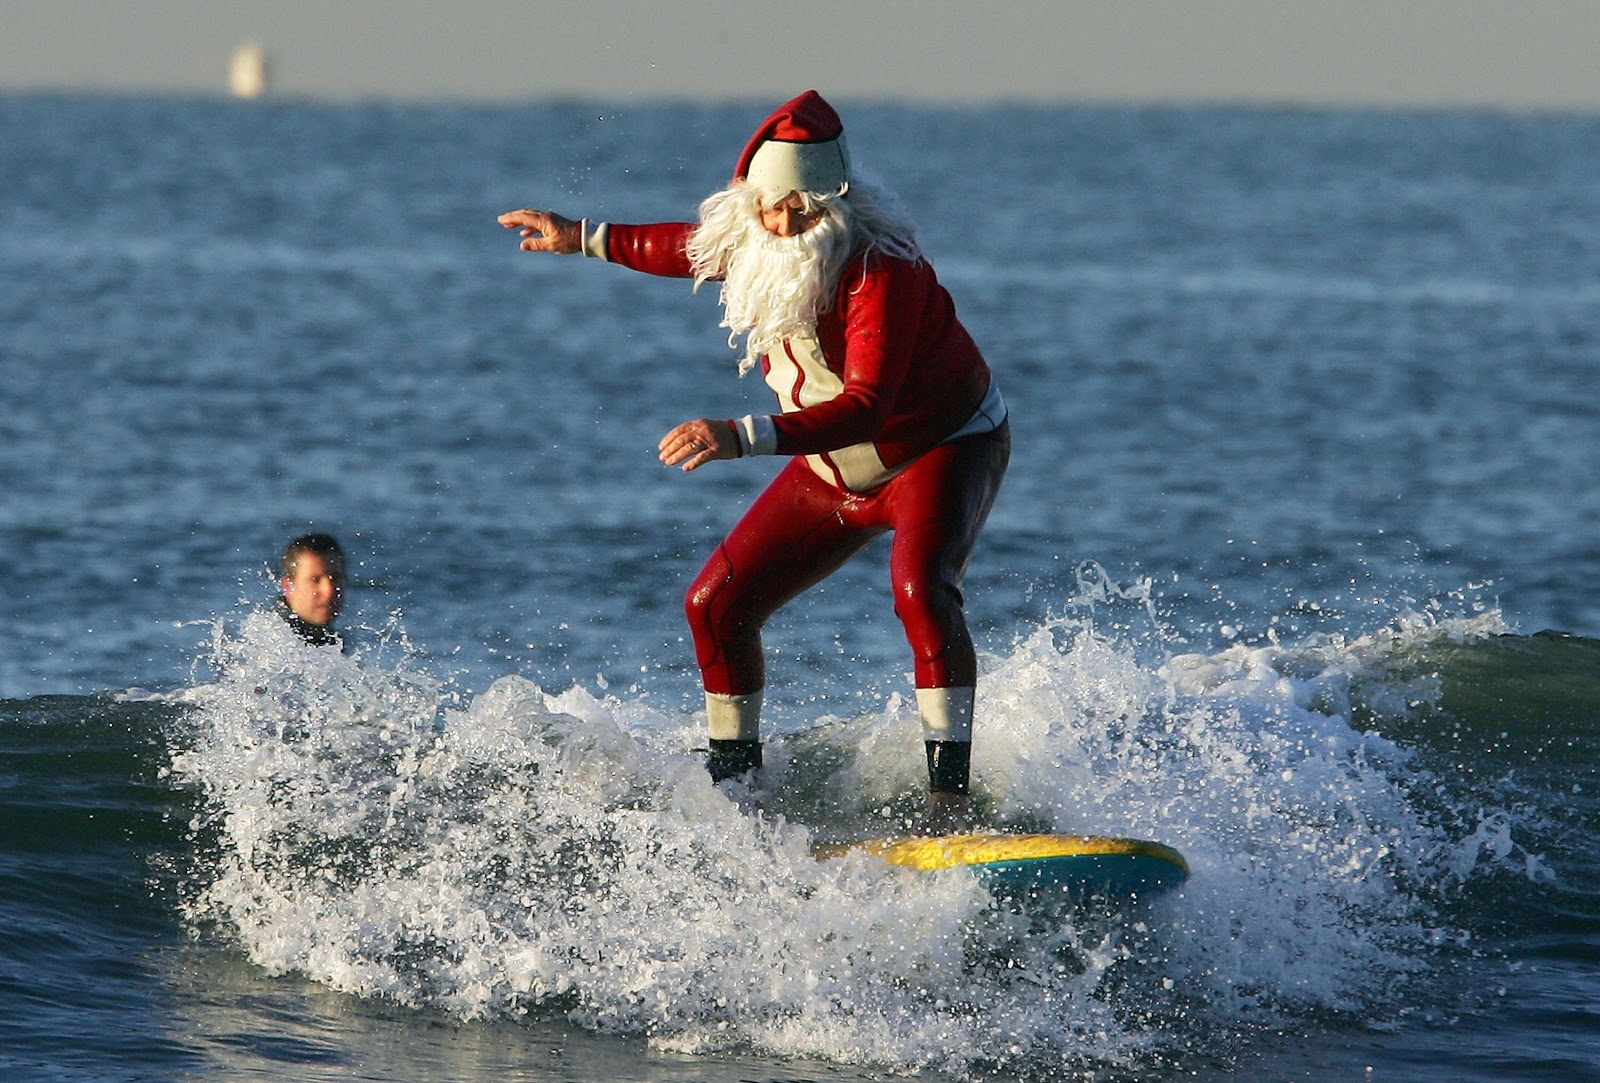 http://1.bp.blogspot.com/-aNx7hncCem4/ULn5gpJUrFI/AAAAAAAAAN8/UXFK5h9fASU/s1600/surfing_santa.jpg